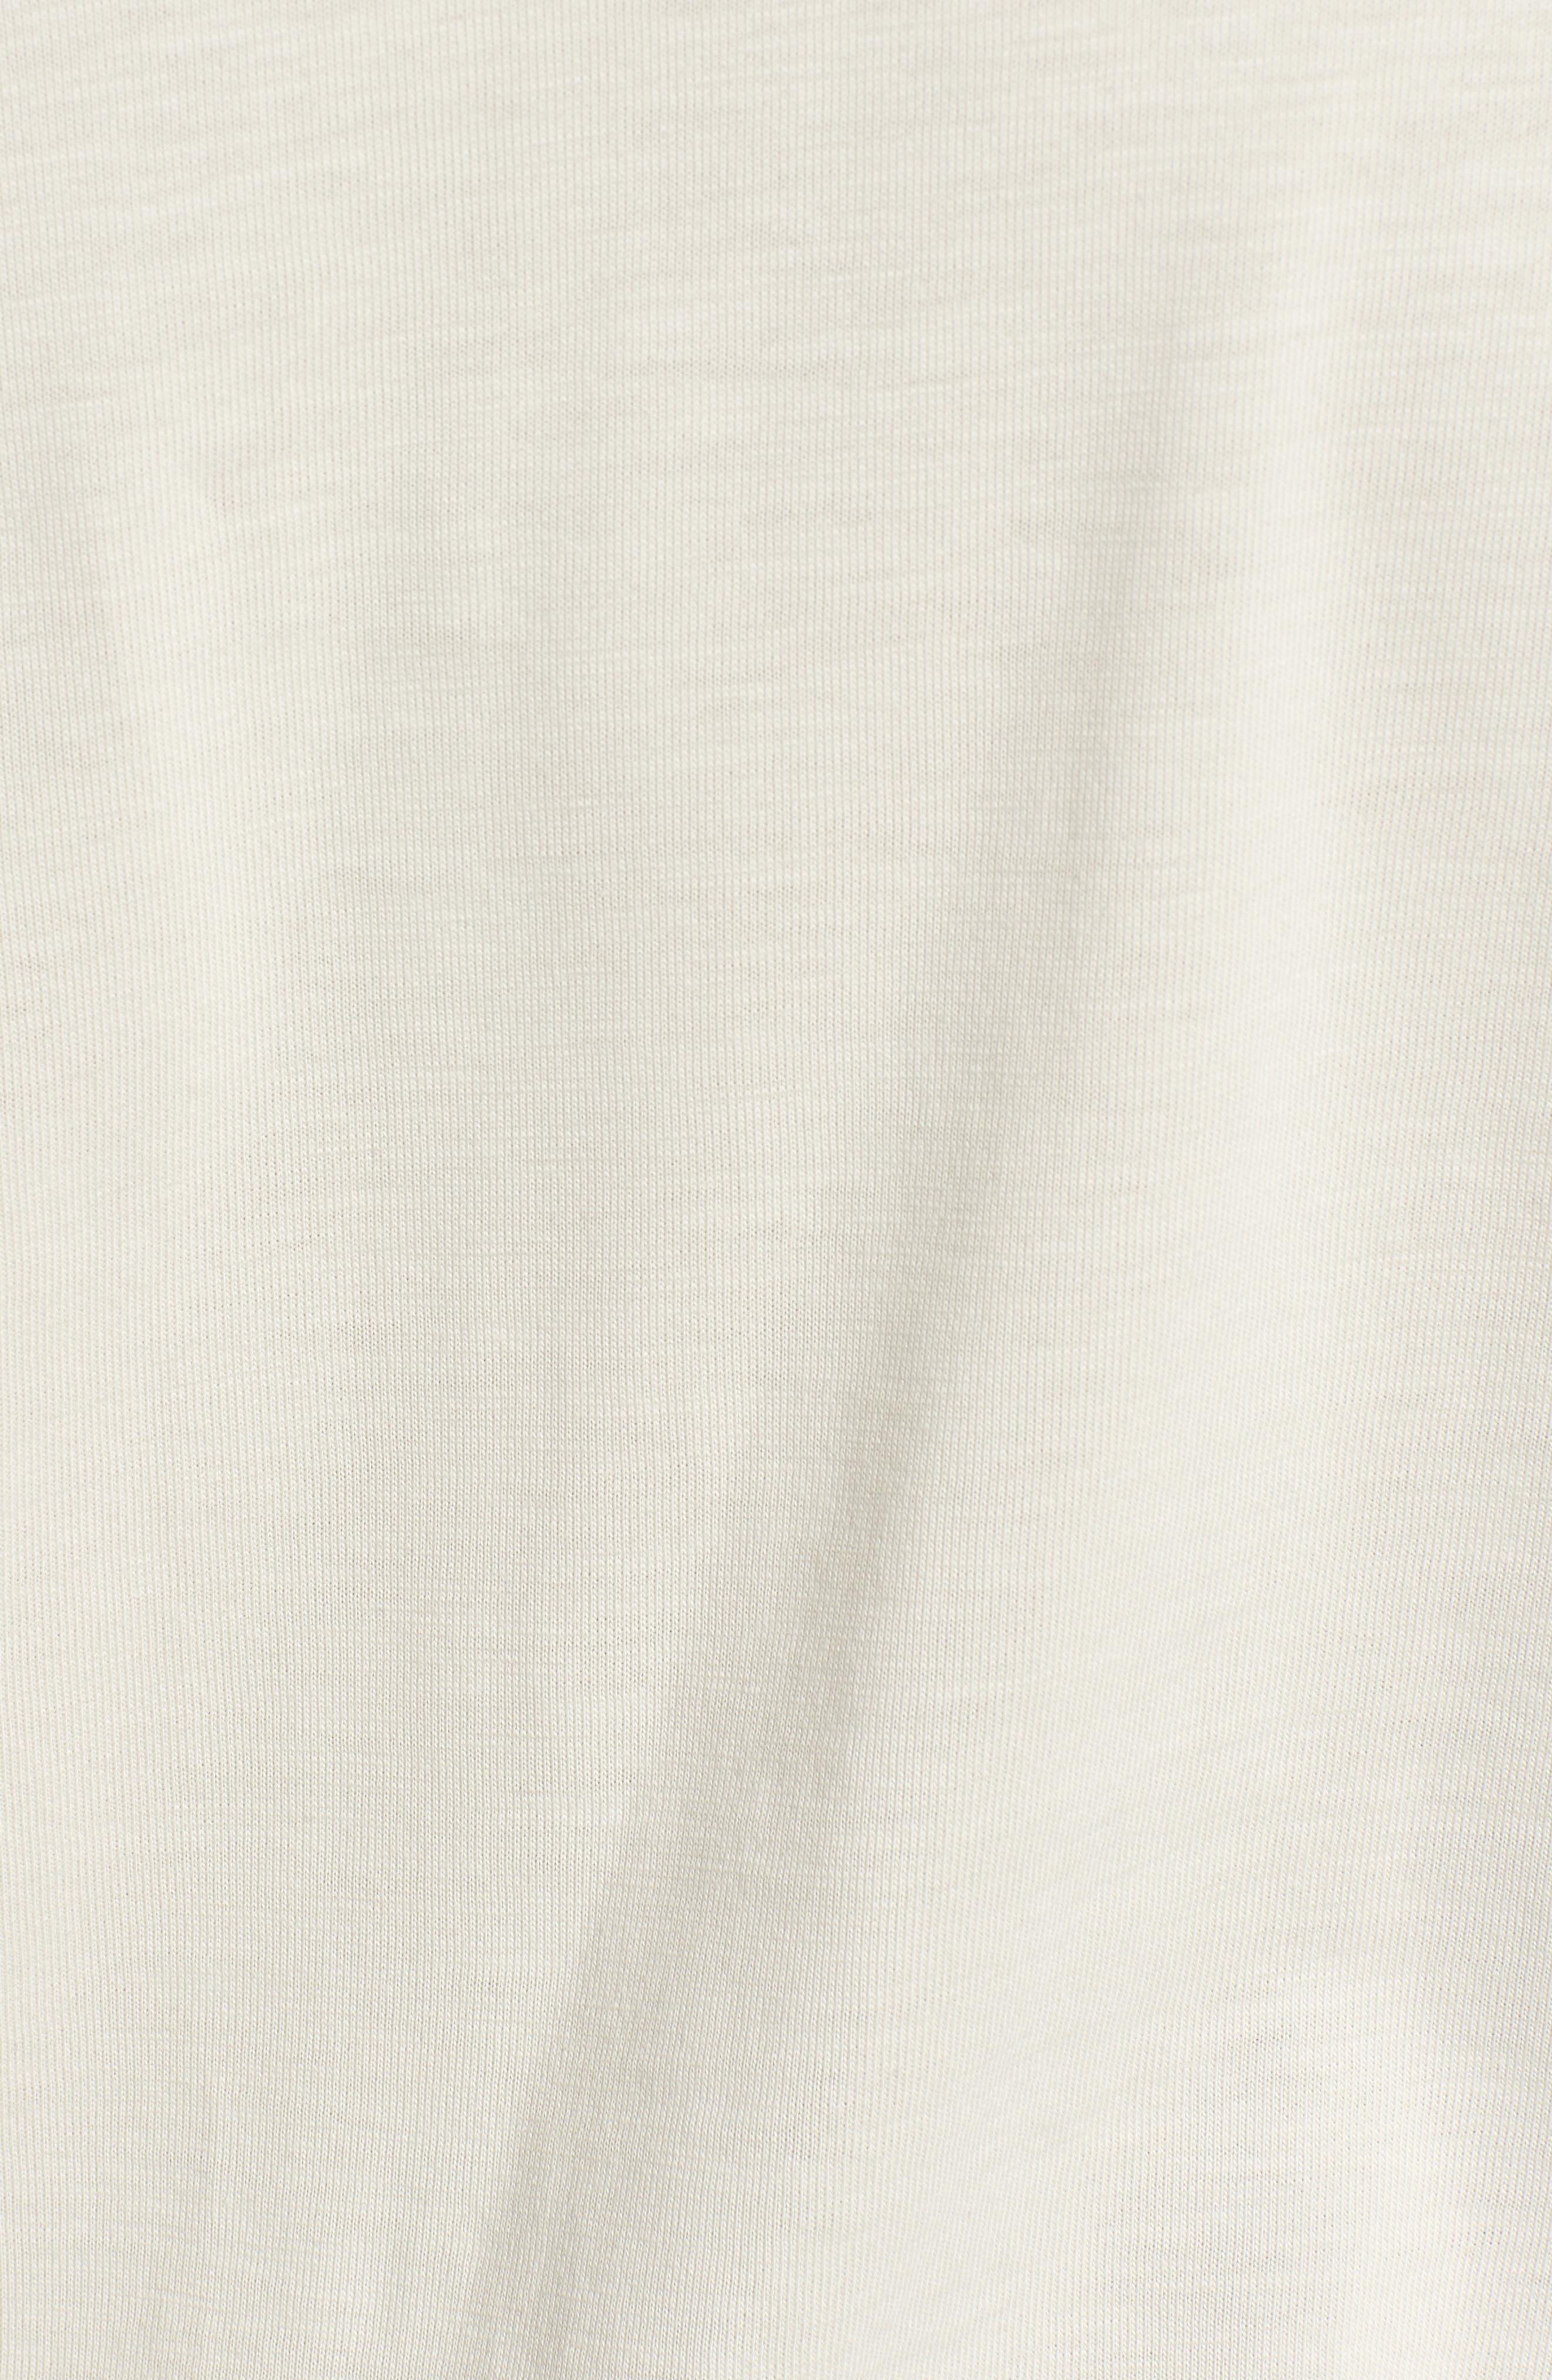 Sportswear AF1 Graphic T-Shirt,                             Alternate thumbnail 5, color,                             LIGHT BONE/ KHAKI